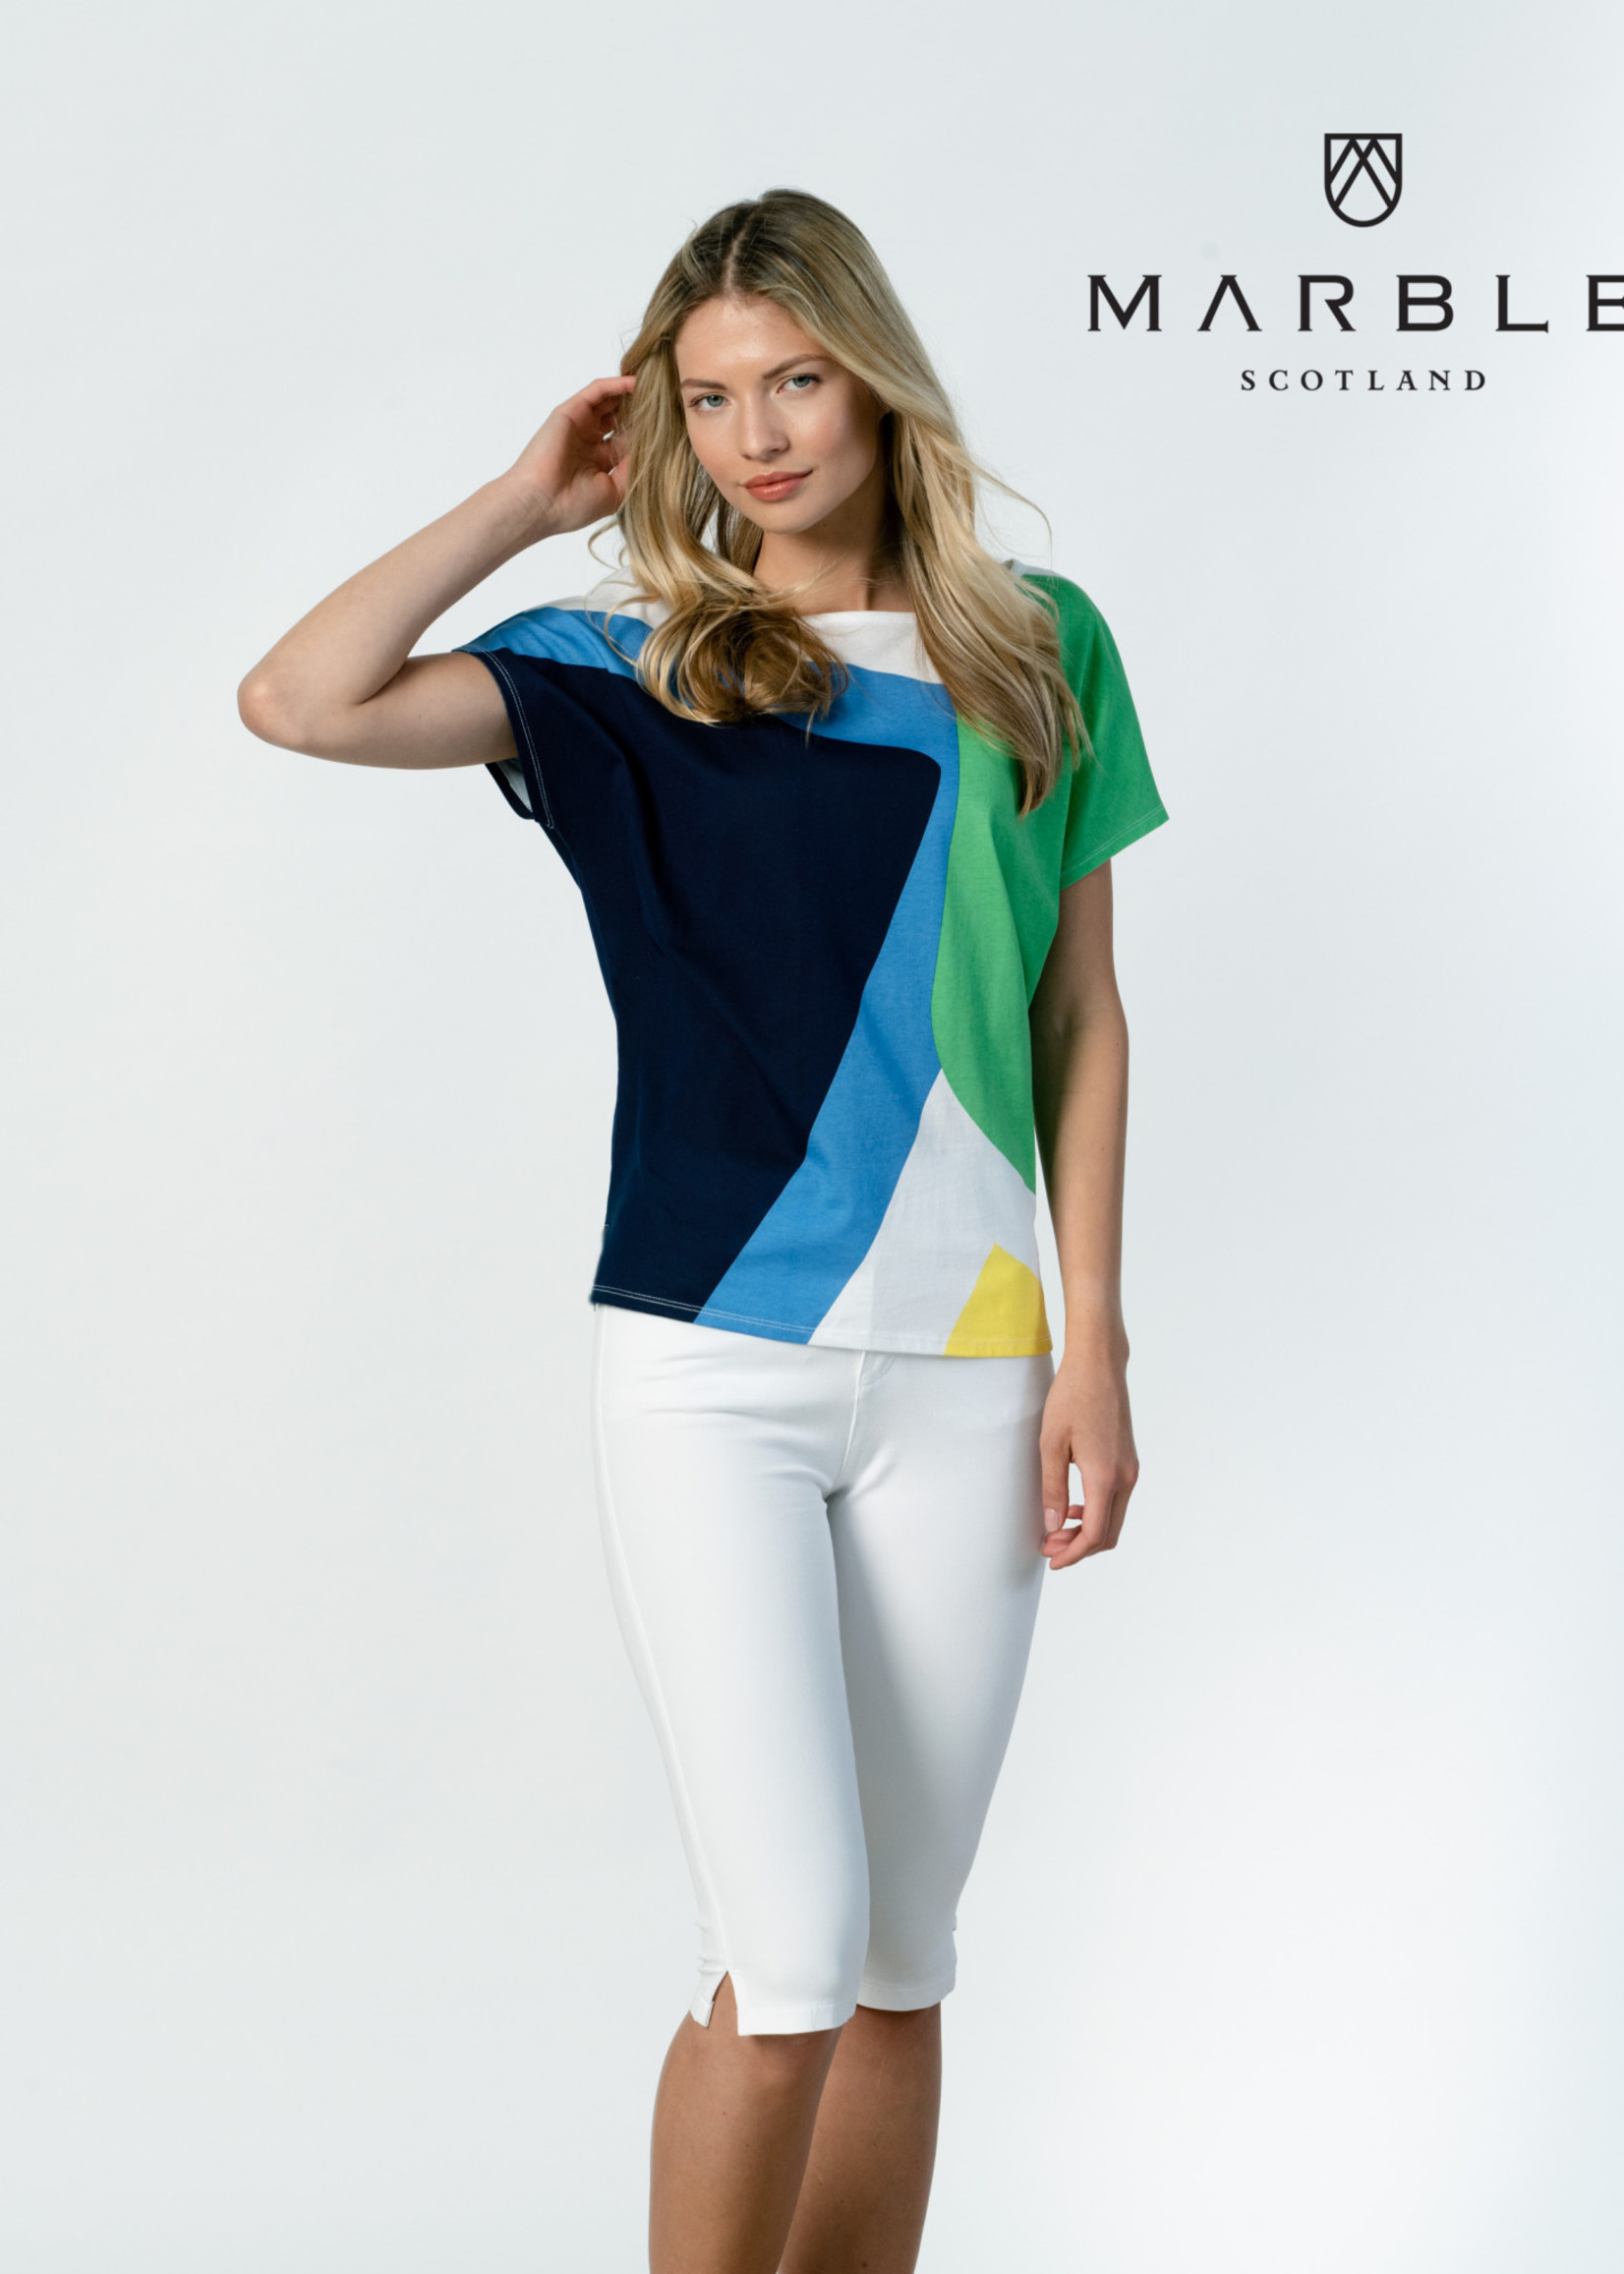 Marble Marble Top Short Sleeve, Colour Blocks